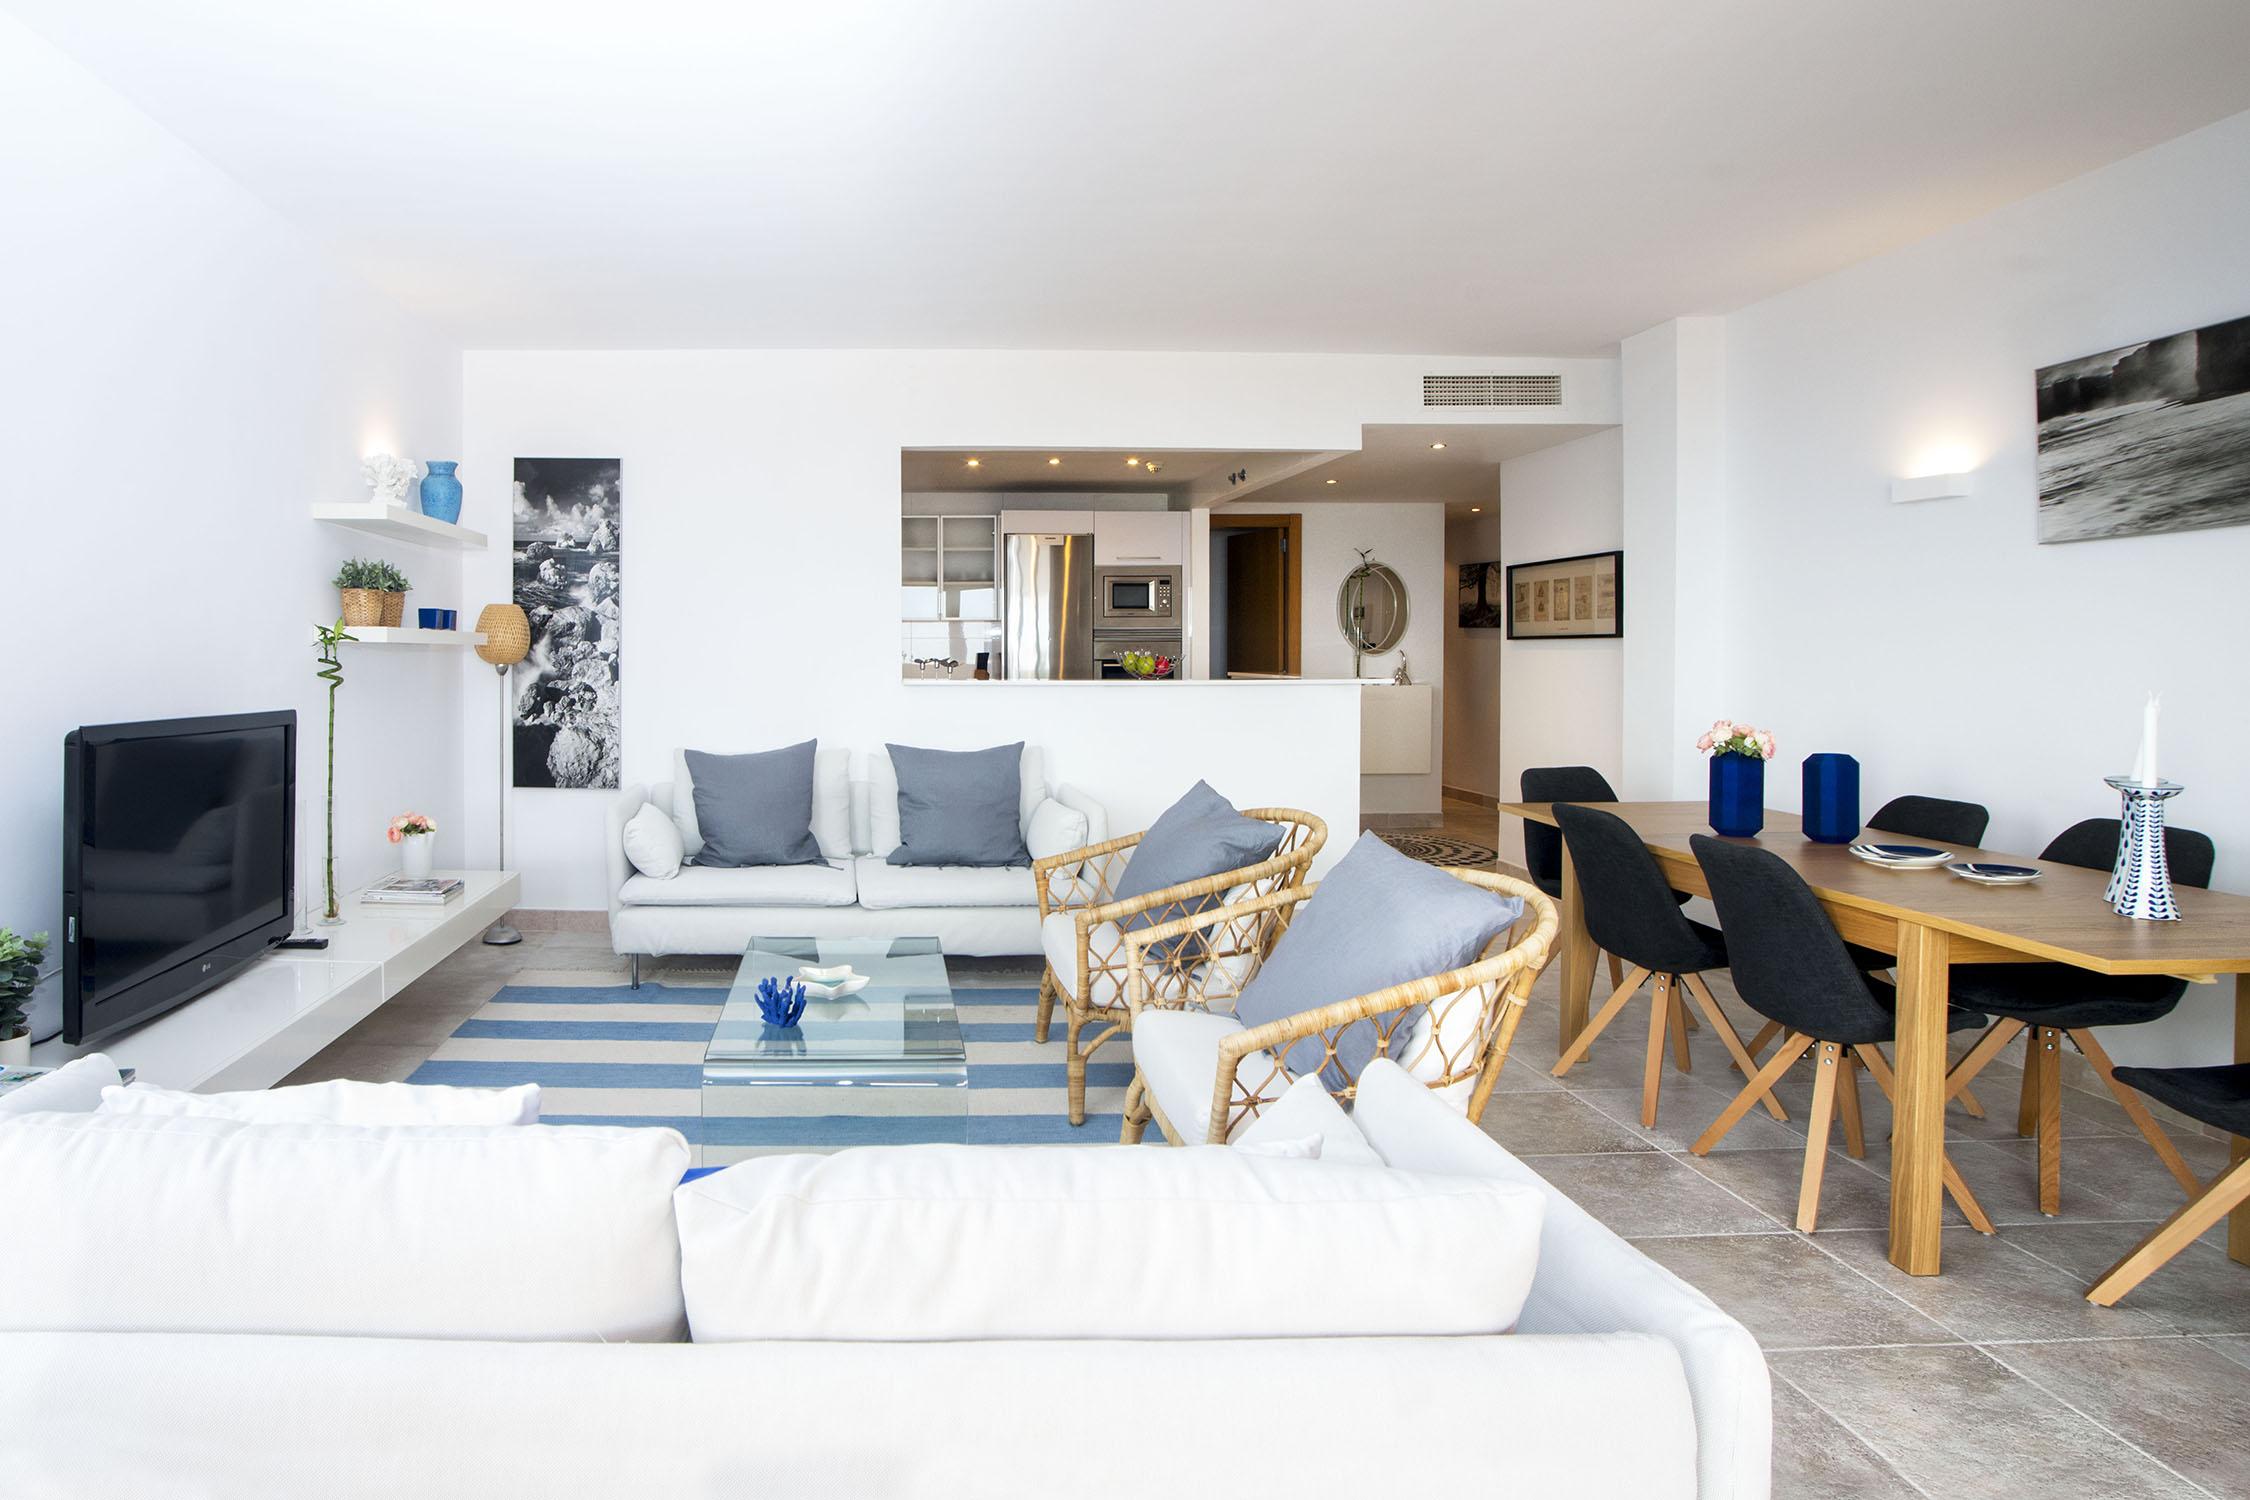 Apartments El Higueron